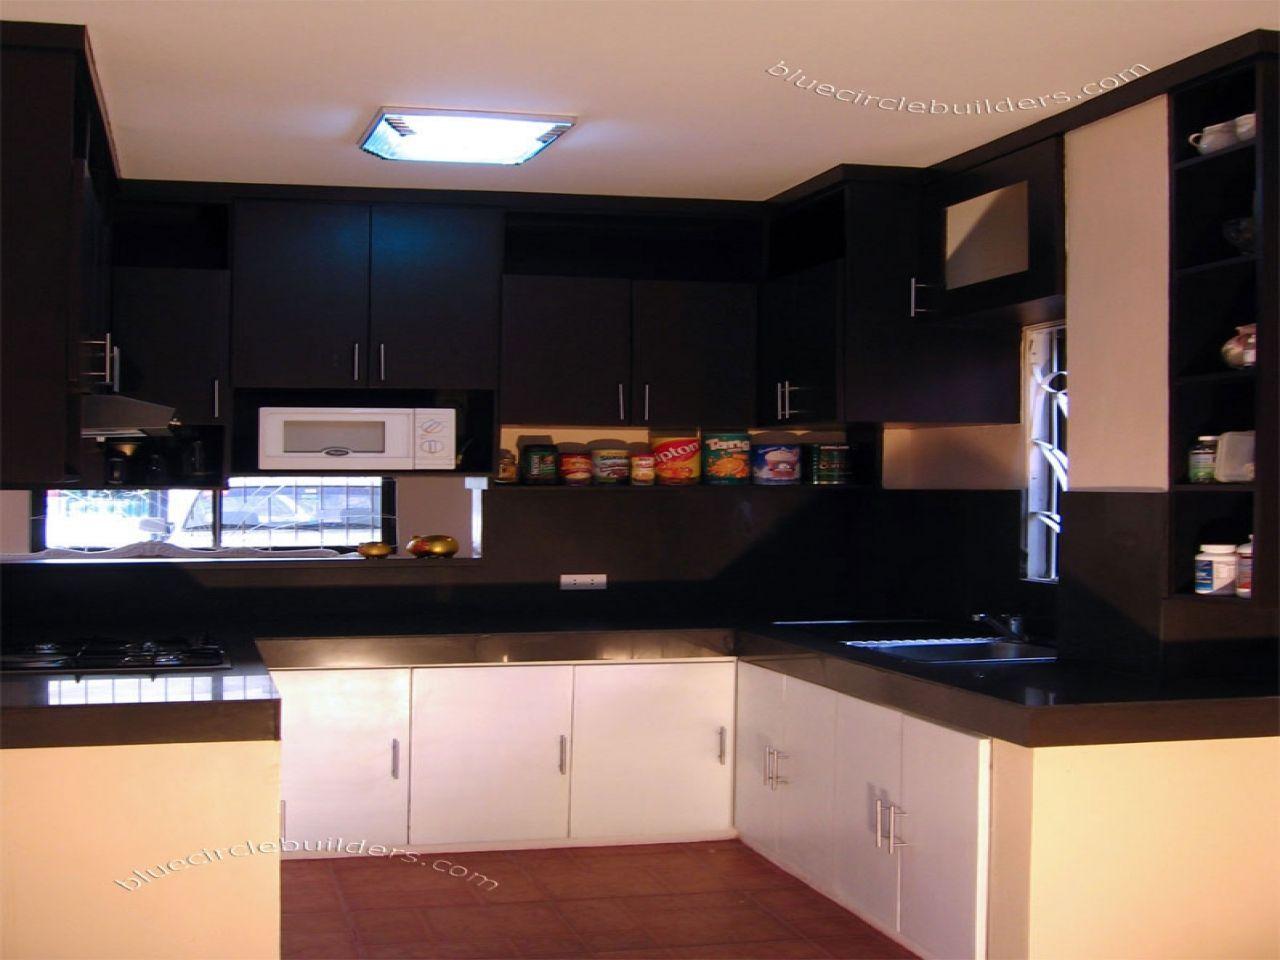 13 Concepts Fashionable Kitchen Cupboard Design Philippines On A Price Range Basementminikitchenidea Simple Kitchen Design Kitchen Layout Small Space Kitchen